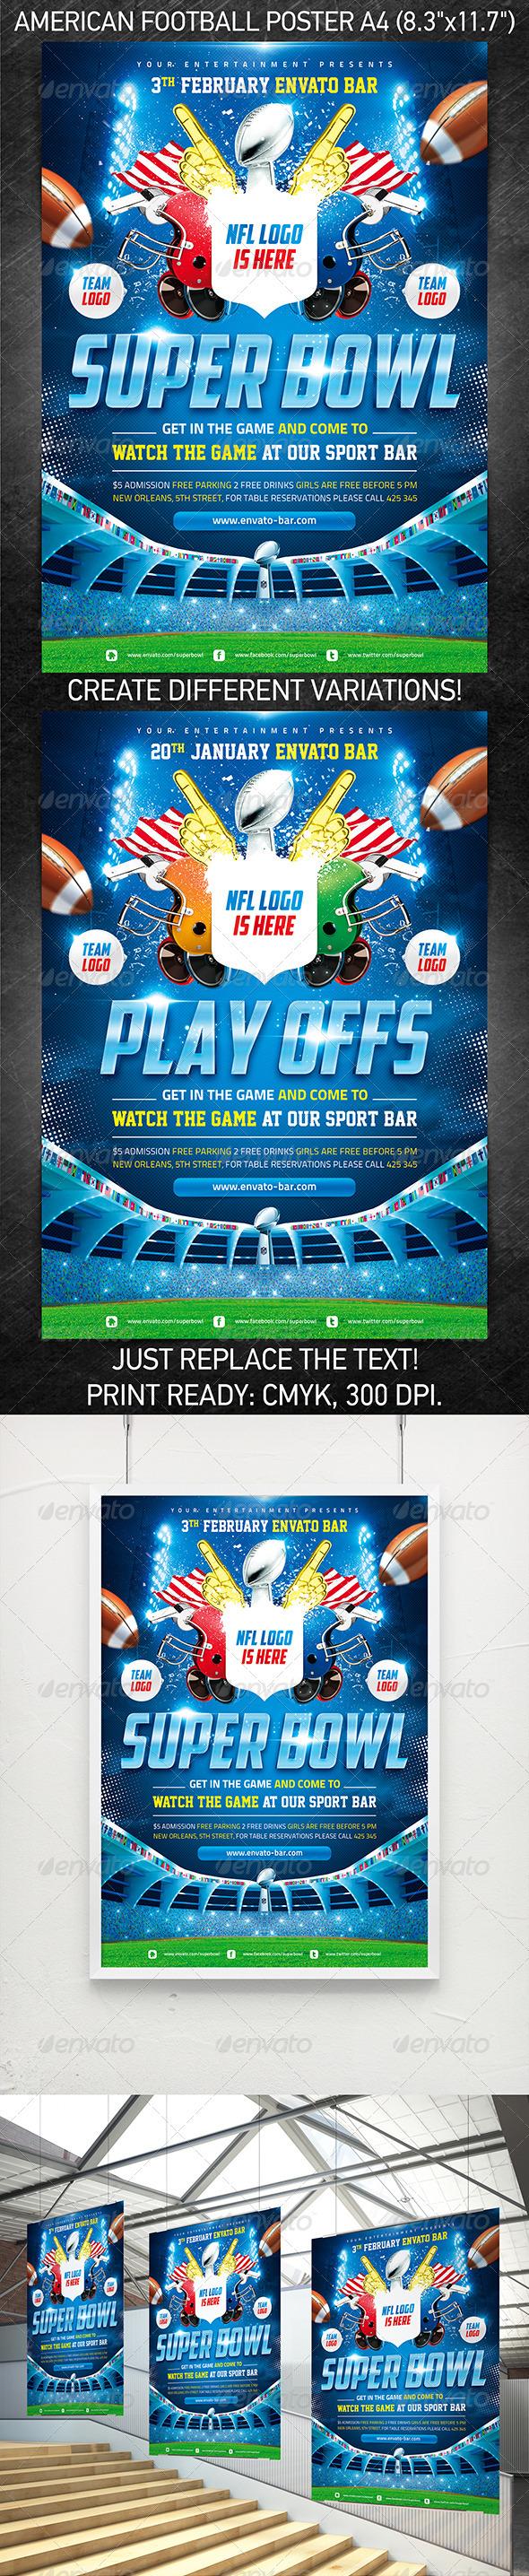 GraphicRiver American Football Super Bowl poster 3762931